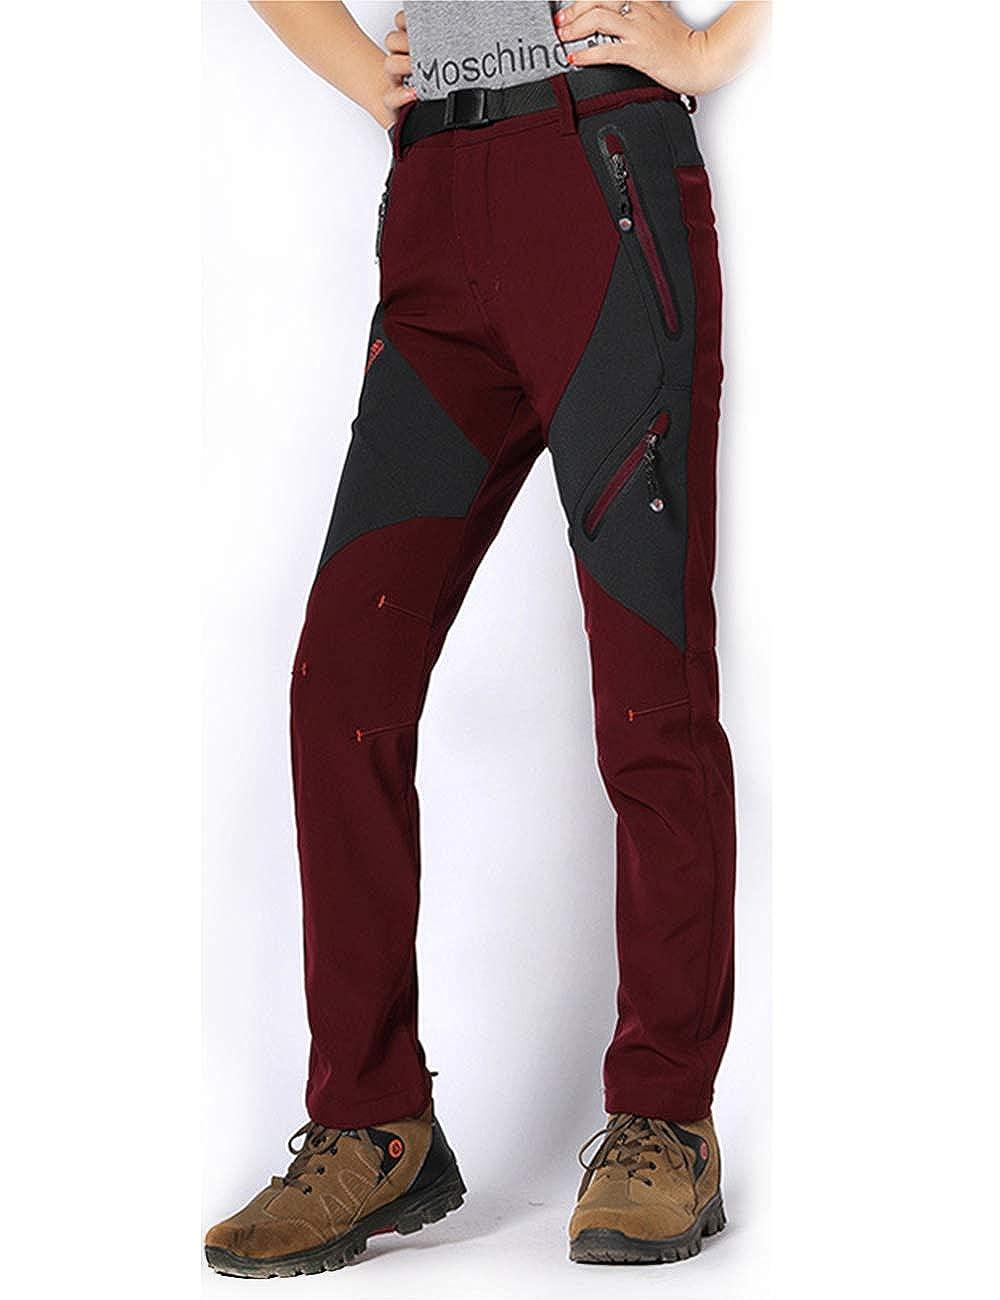 MAGCOMSEN Womens Fleece Lined Softshell Pants Waterproof Snowboarding Skiing Pants with 4 Zip Pockets